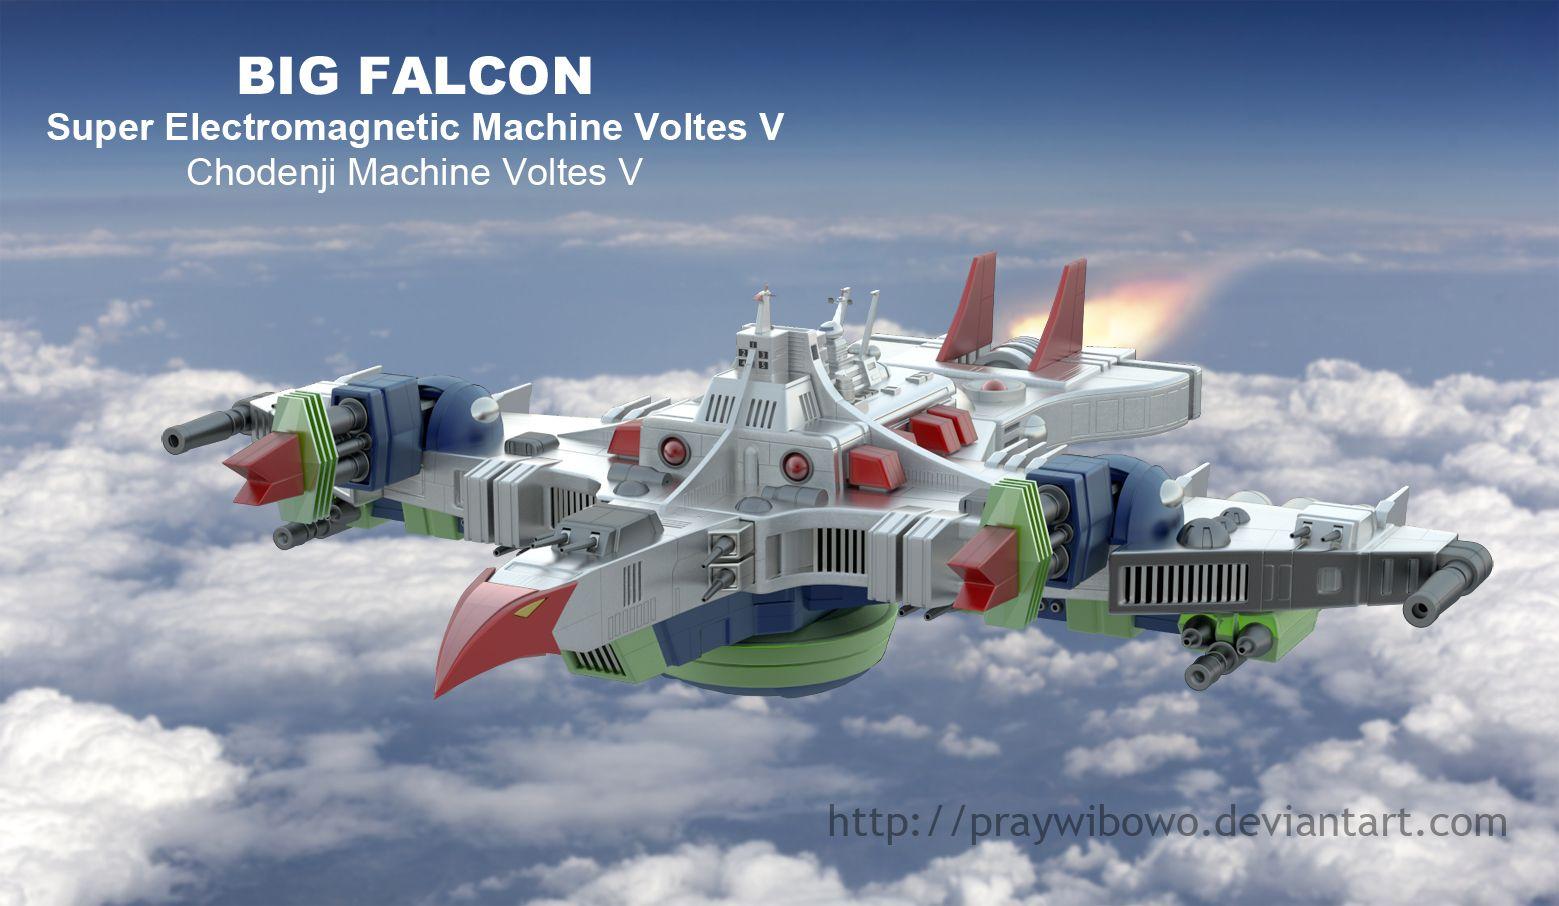 voltes 5 | Voltes V Big Falcon by praywibowo on deviantART